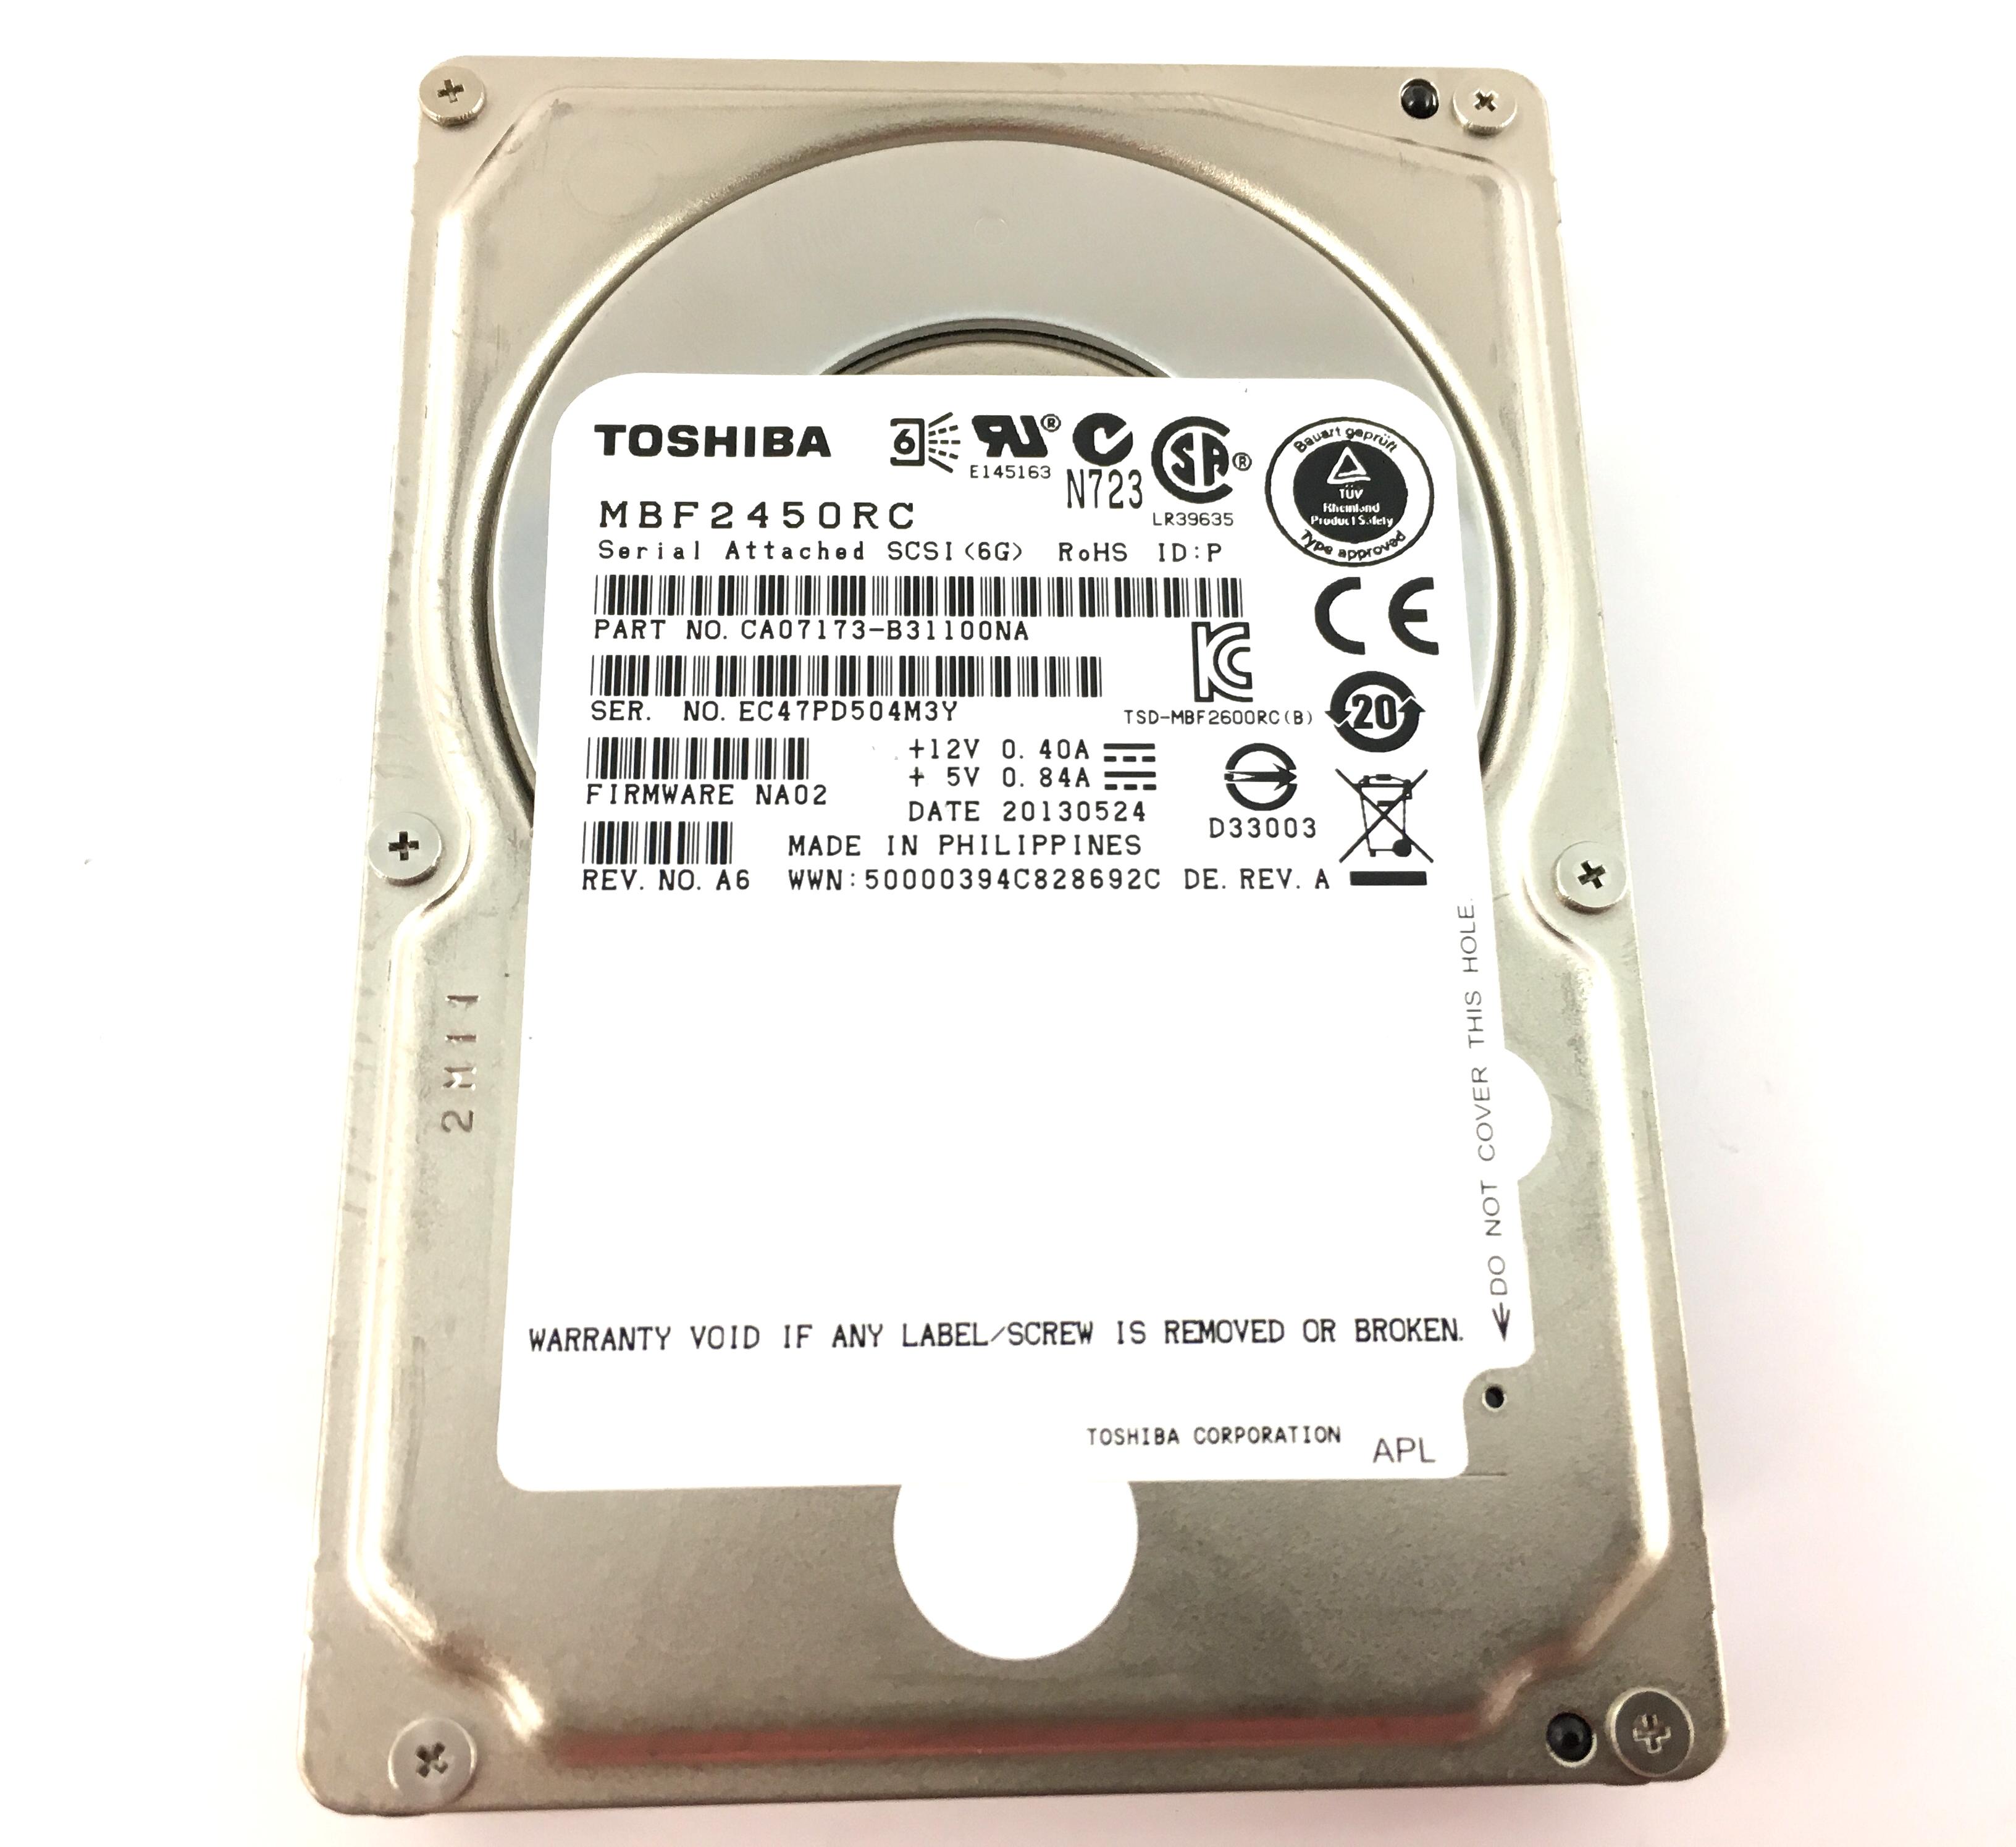 Toshiba 450GB 10K 6Gbps SAS 2.5'' Hard Drive W/ NETAPP FIRMWARE (MBF2450RC)